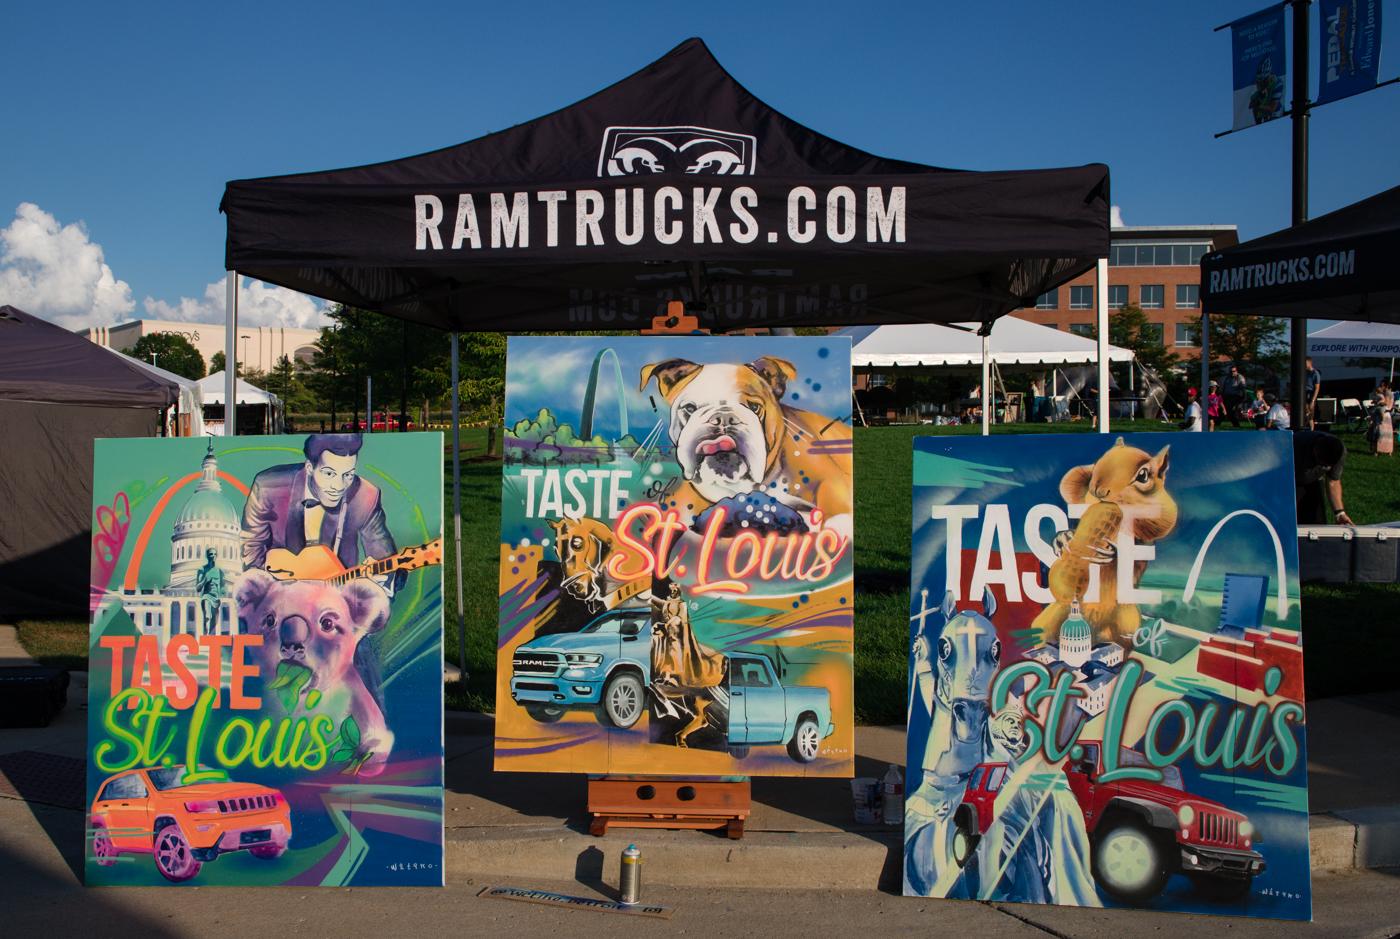 Taste of st. Louis - St. Louis, MO